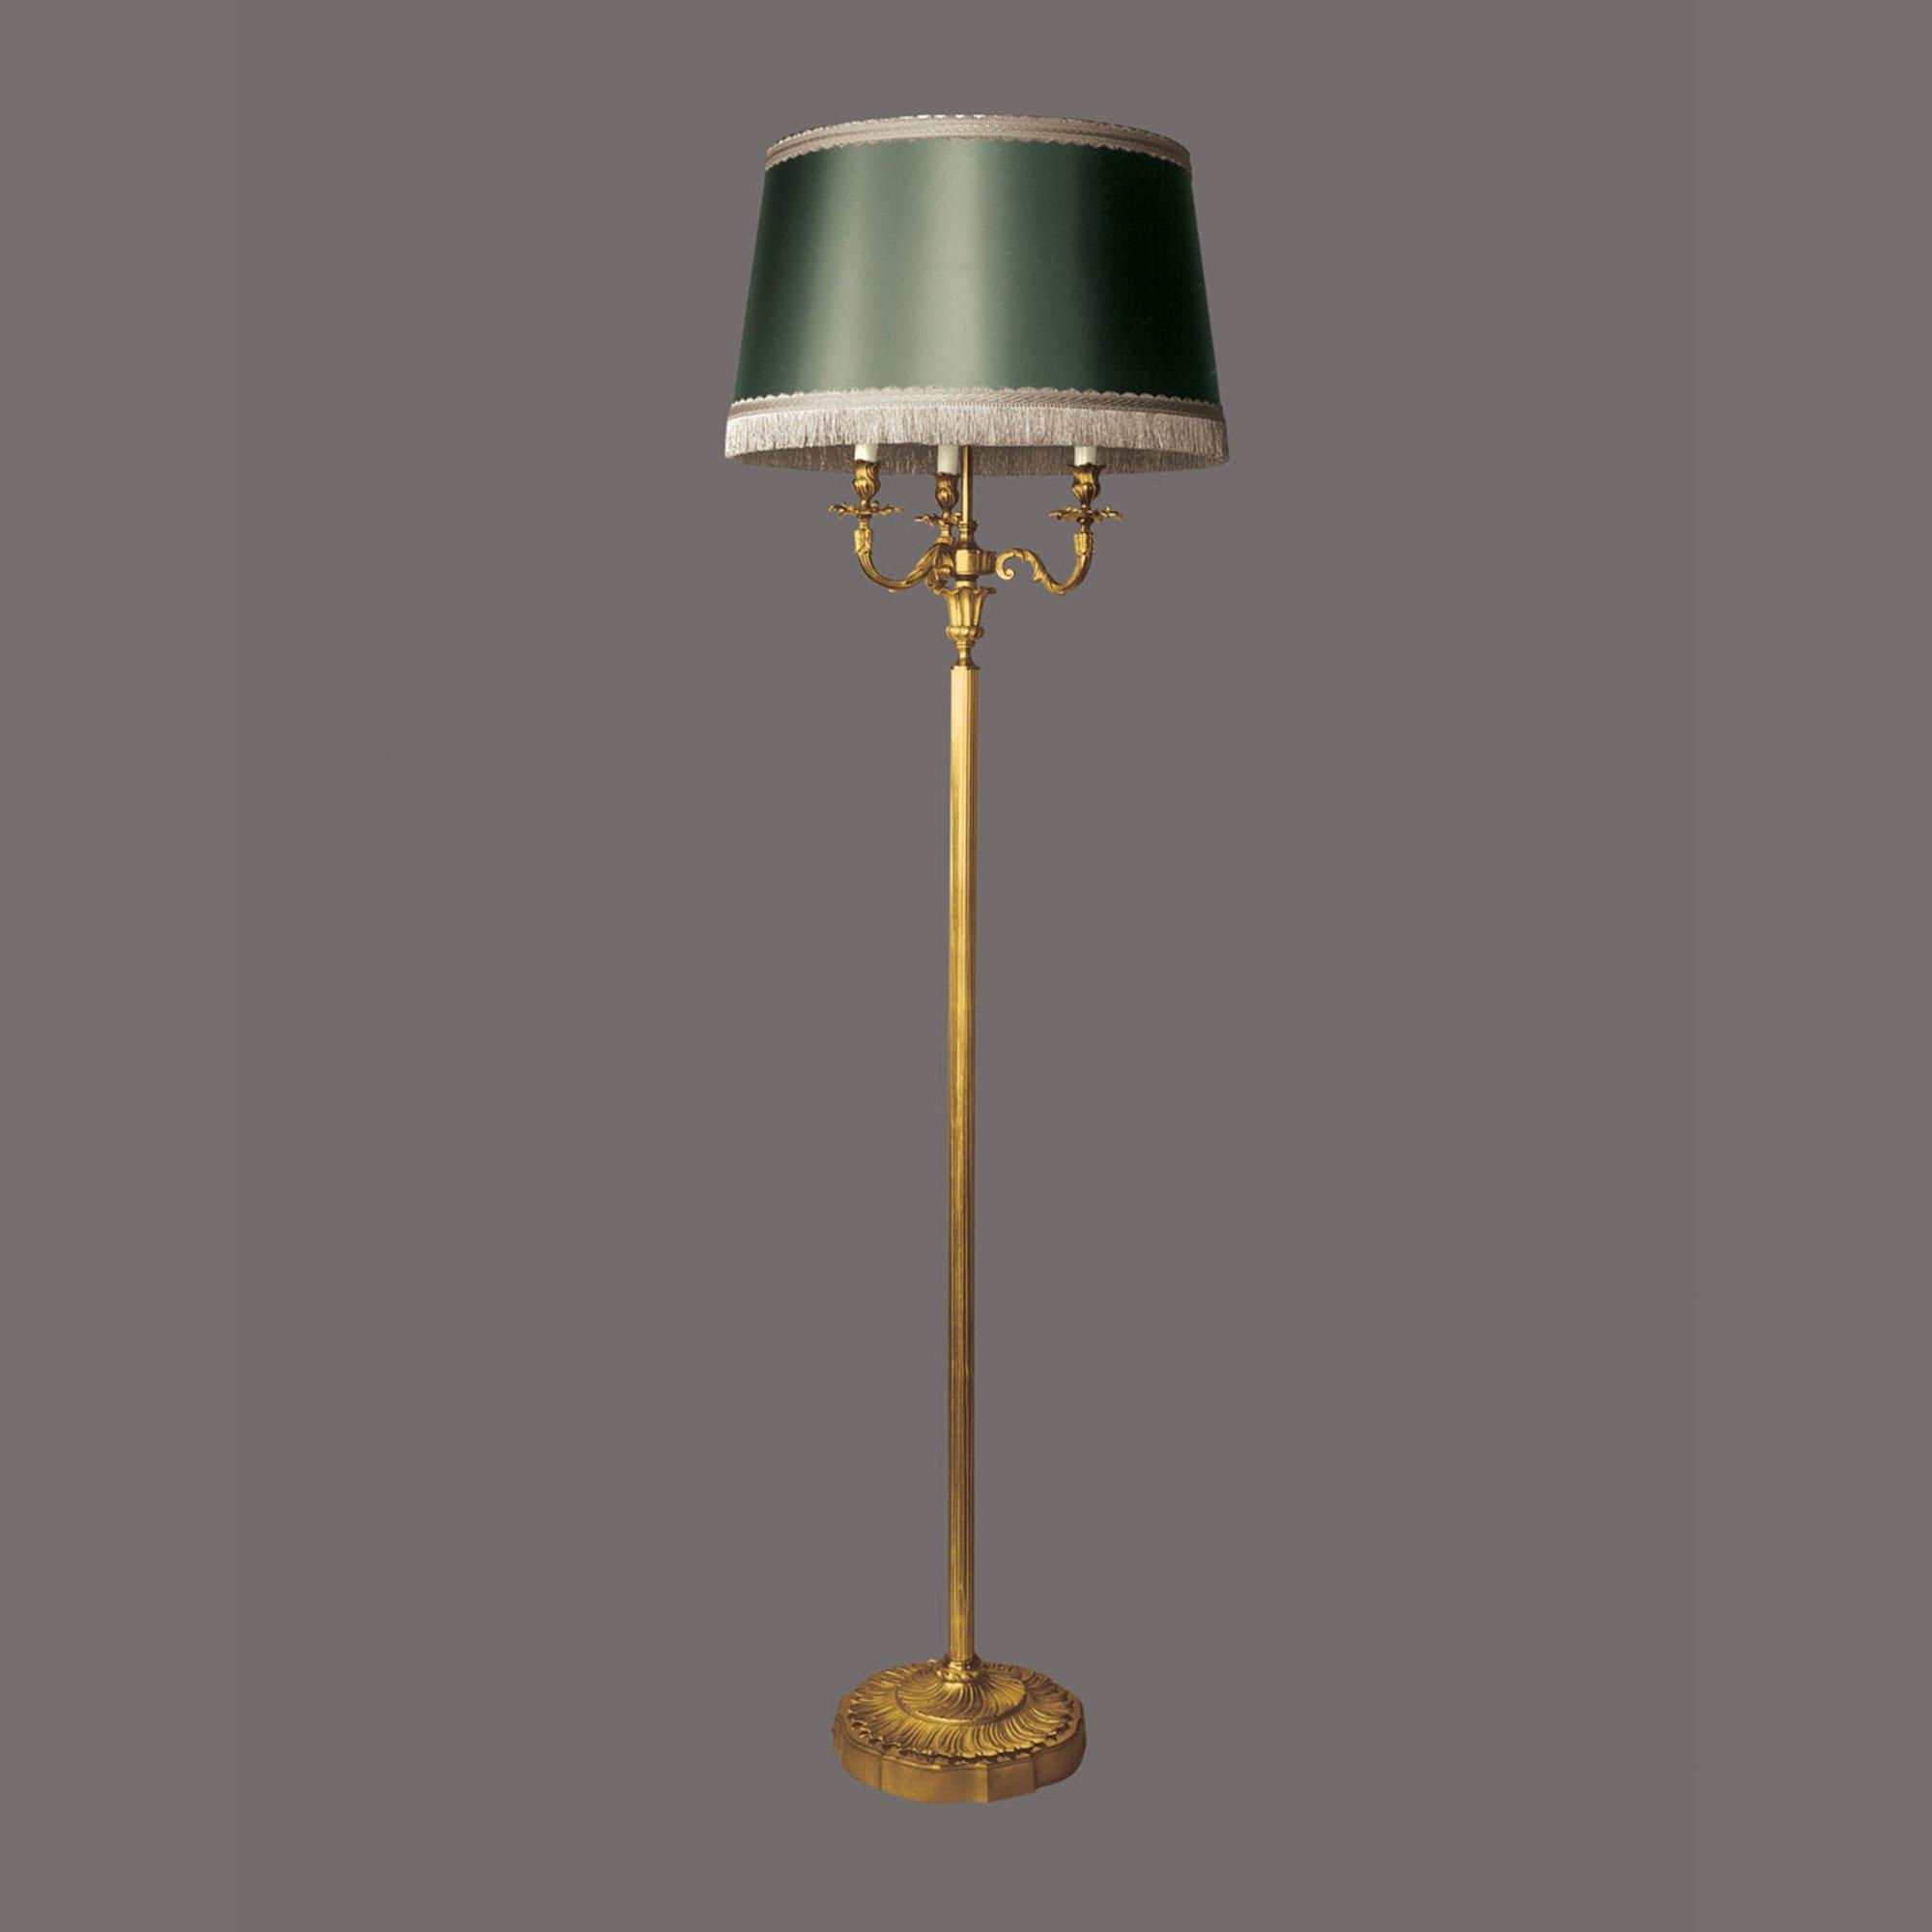 Louis XVI floor lamp